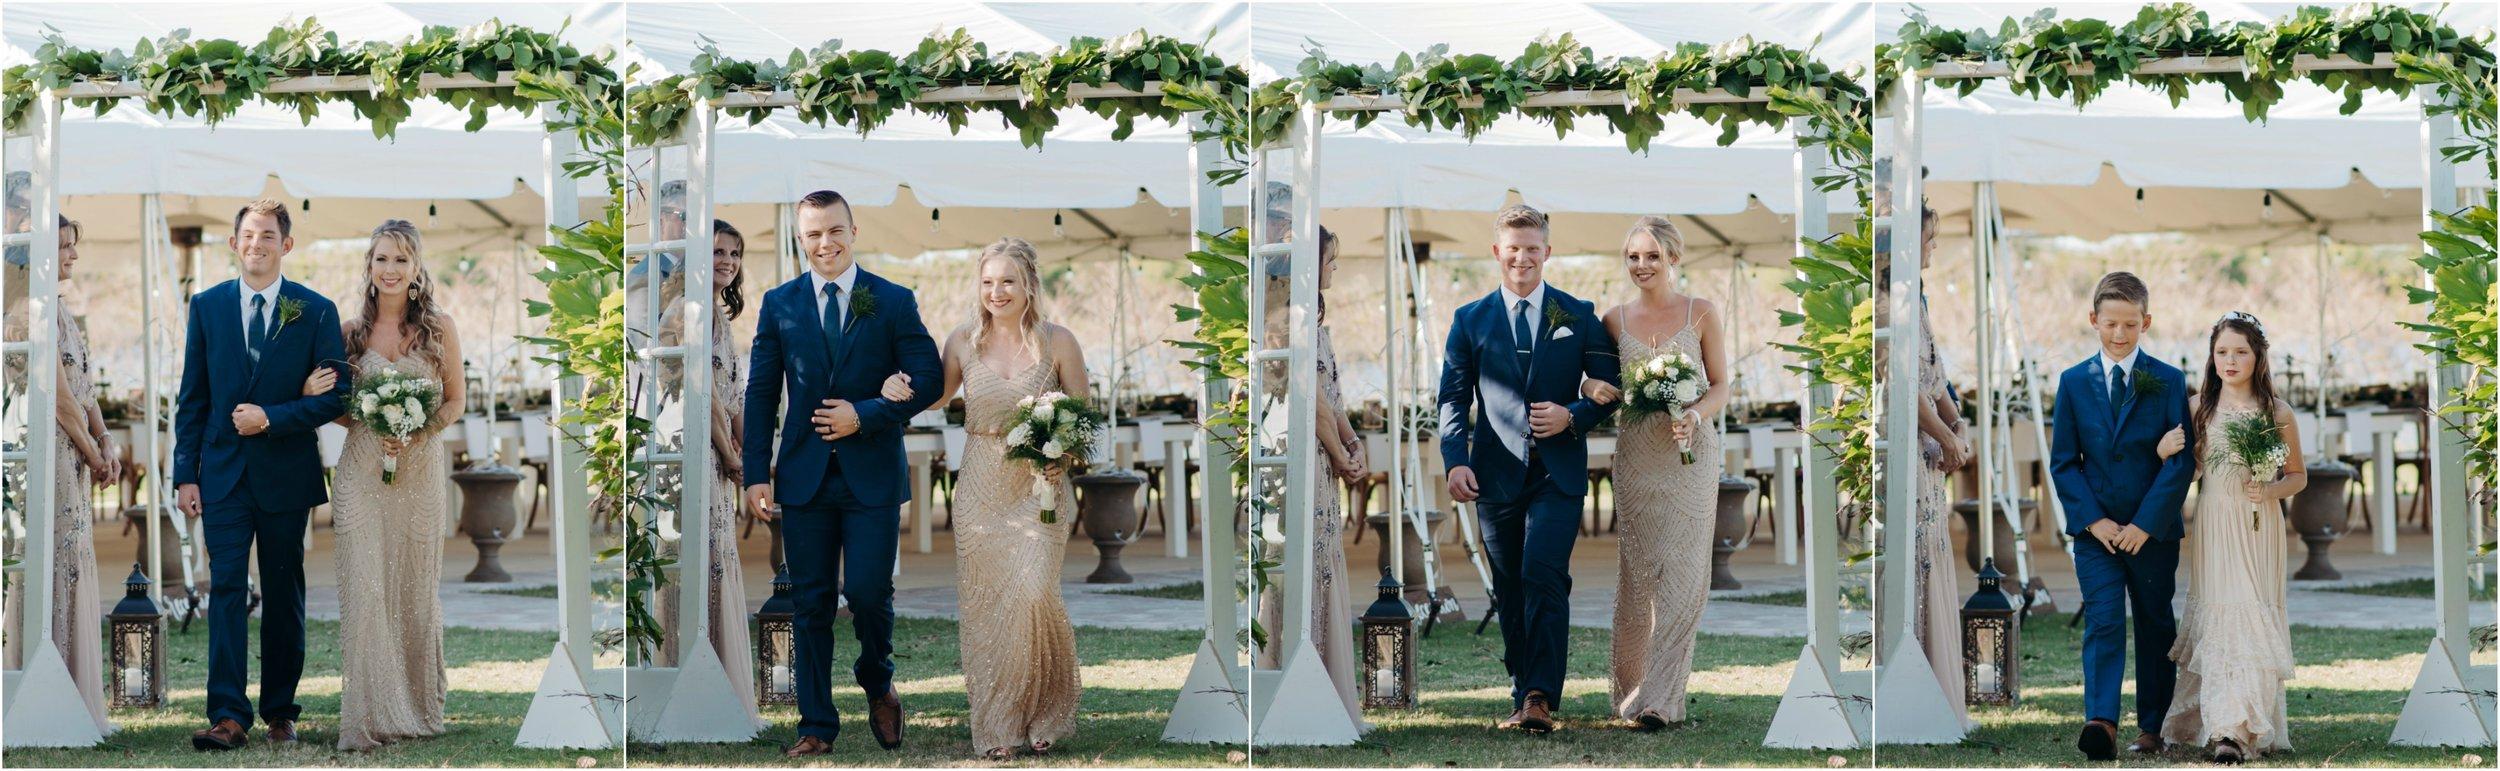 micayla-greyson-wedding-ceremony-intros-2.jpg